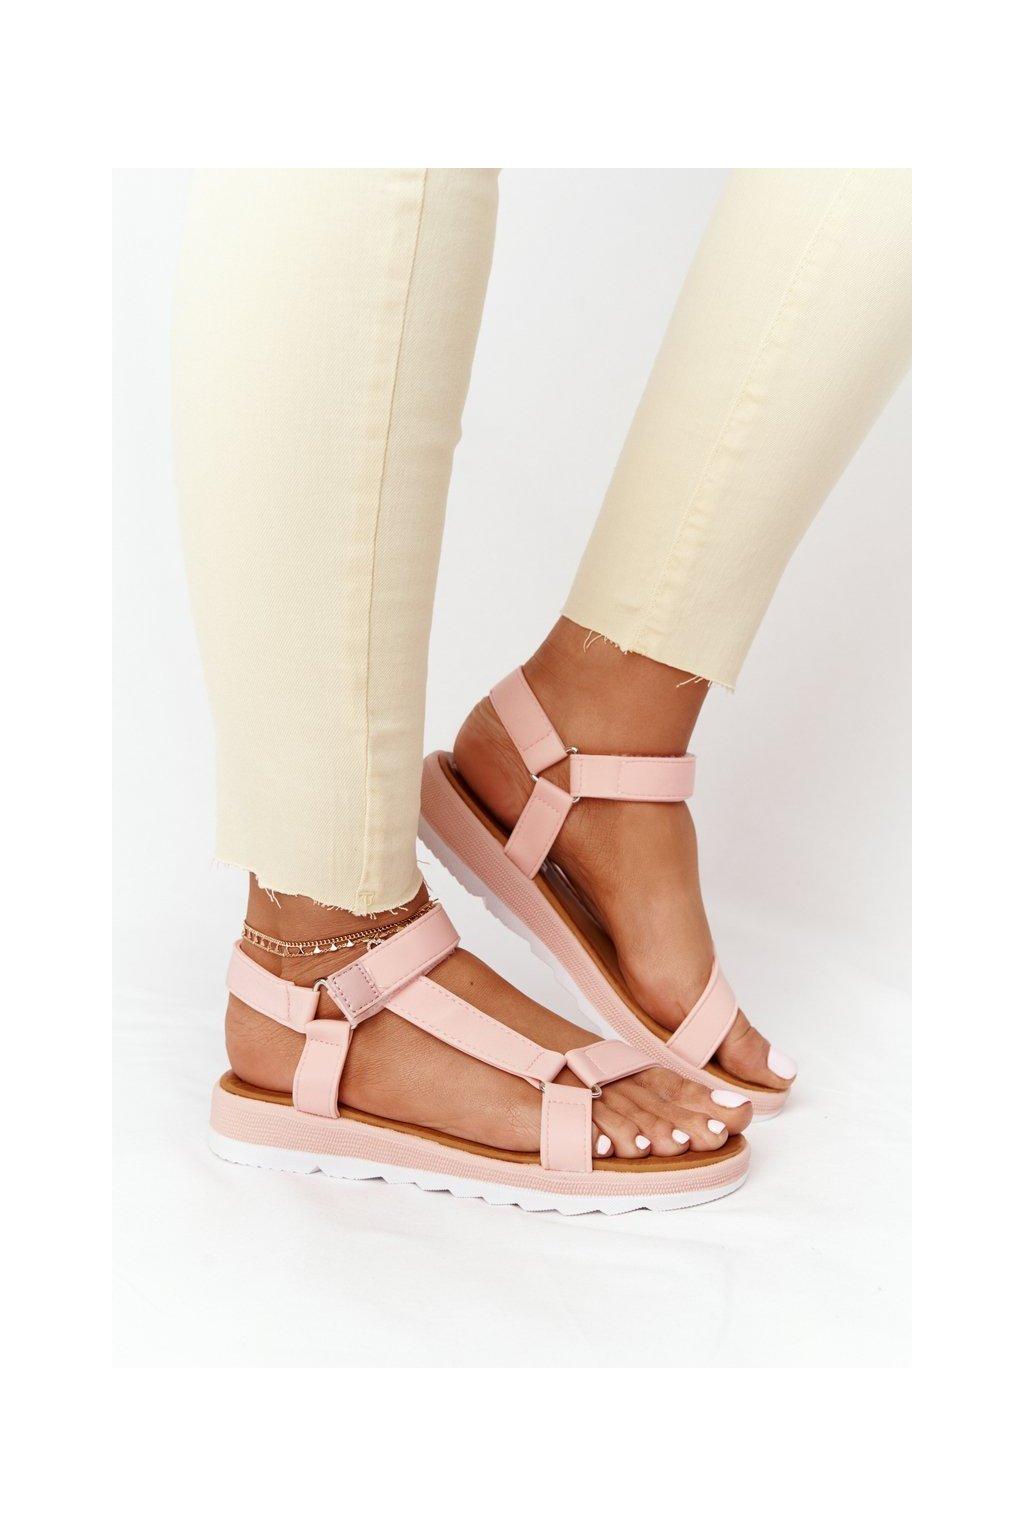 Dámske sandále s plochou podrážkou na platforme farba ružová kód obuvi WS9027-11 PINK